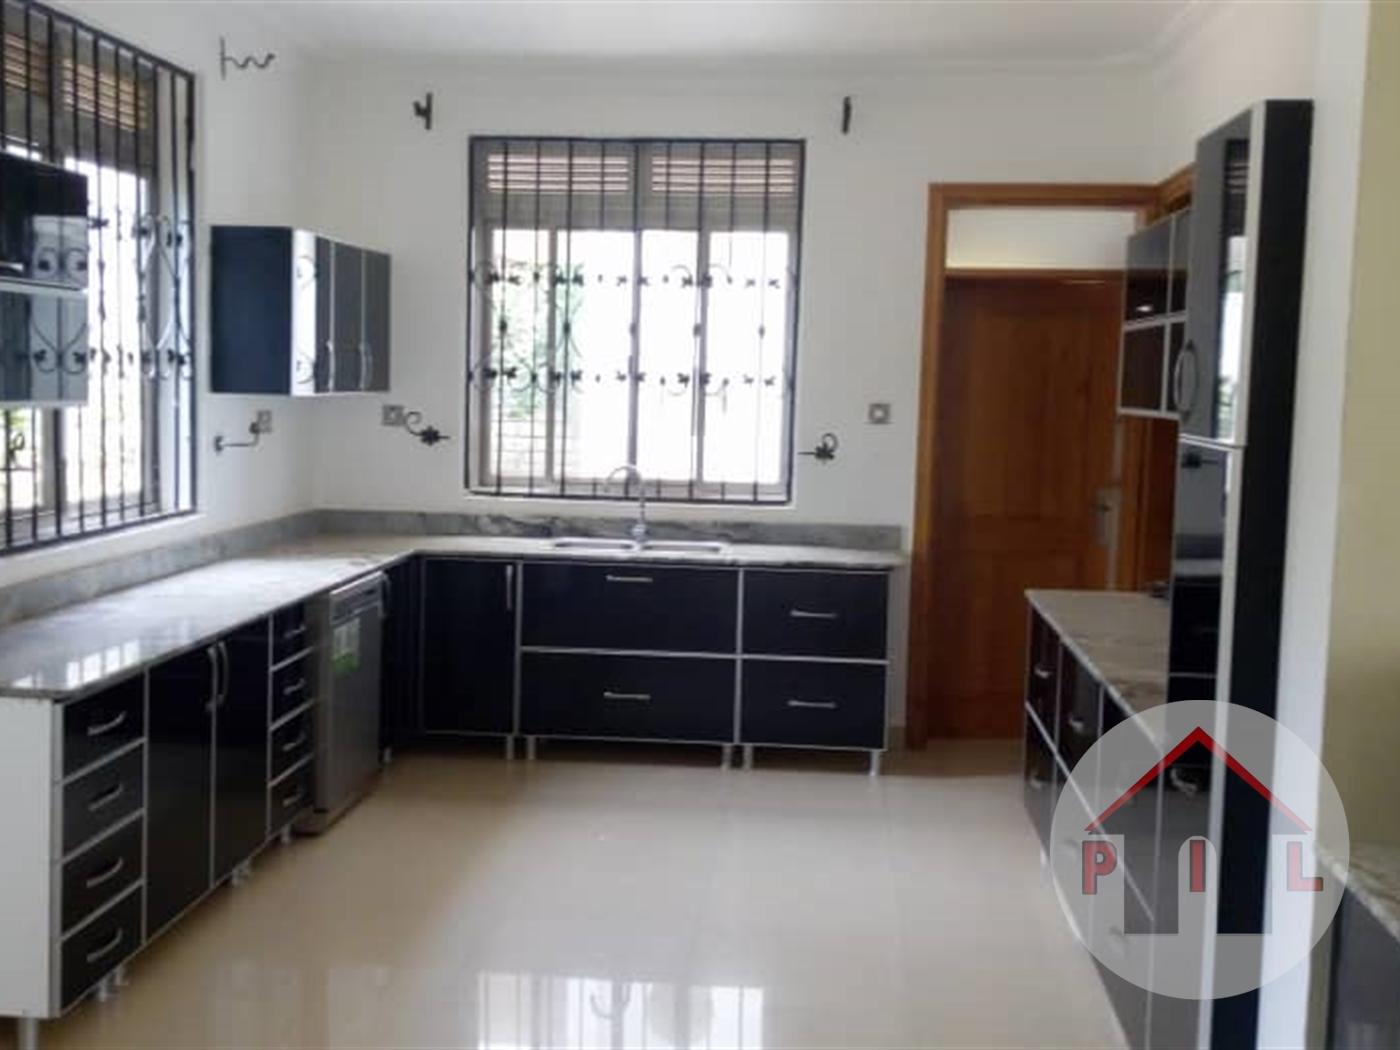 Apartment for sale in Namugongo Wakiso